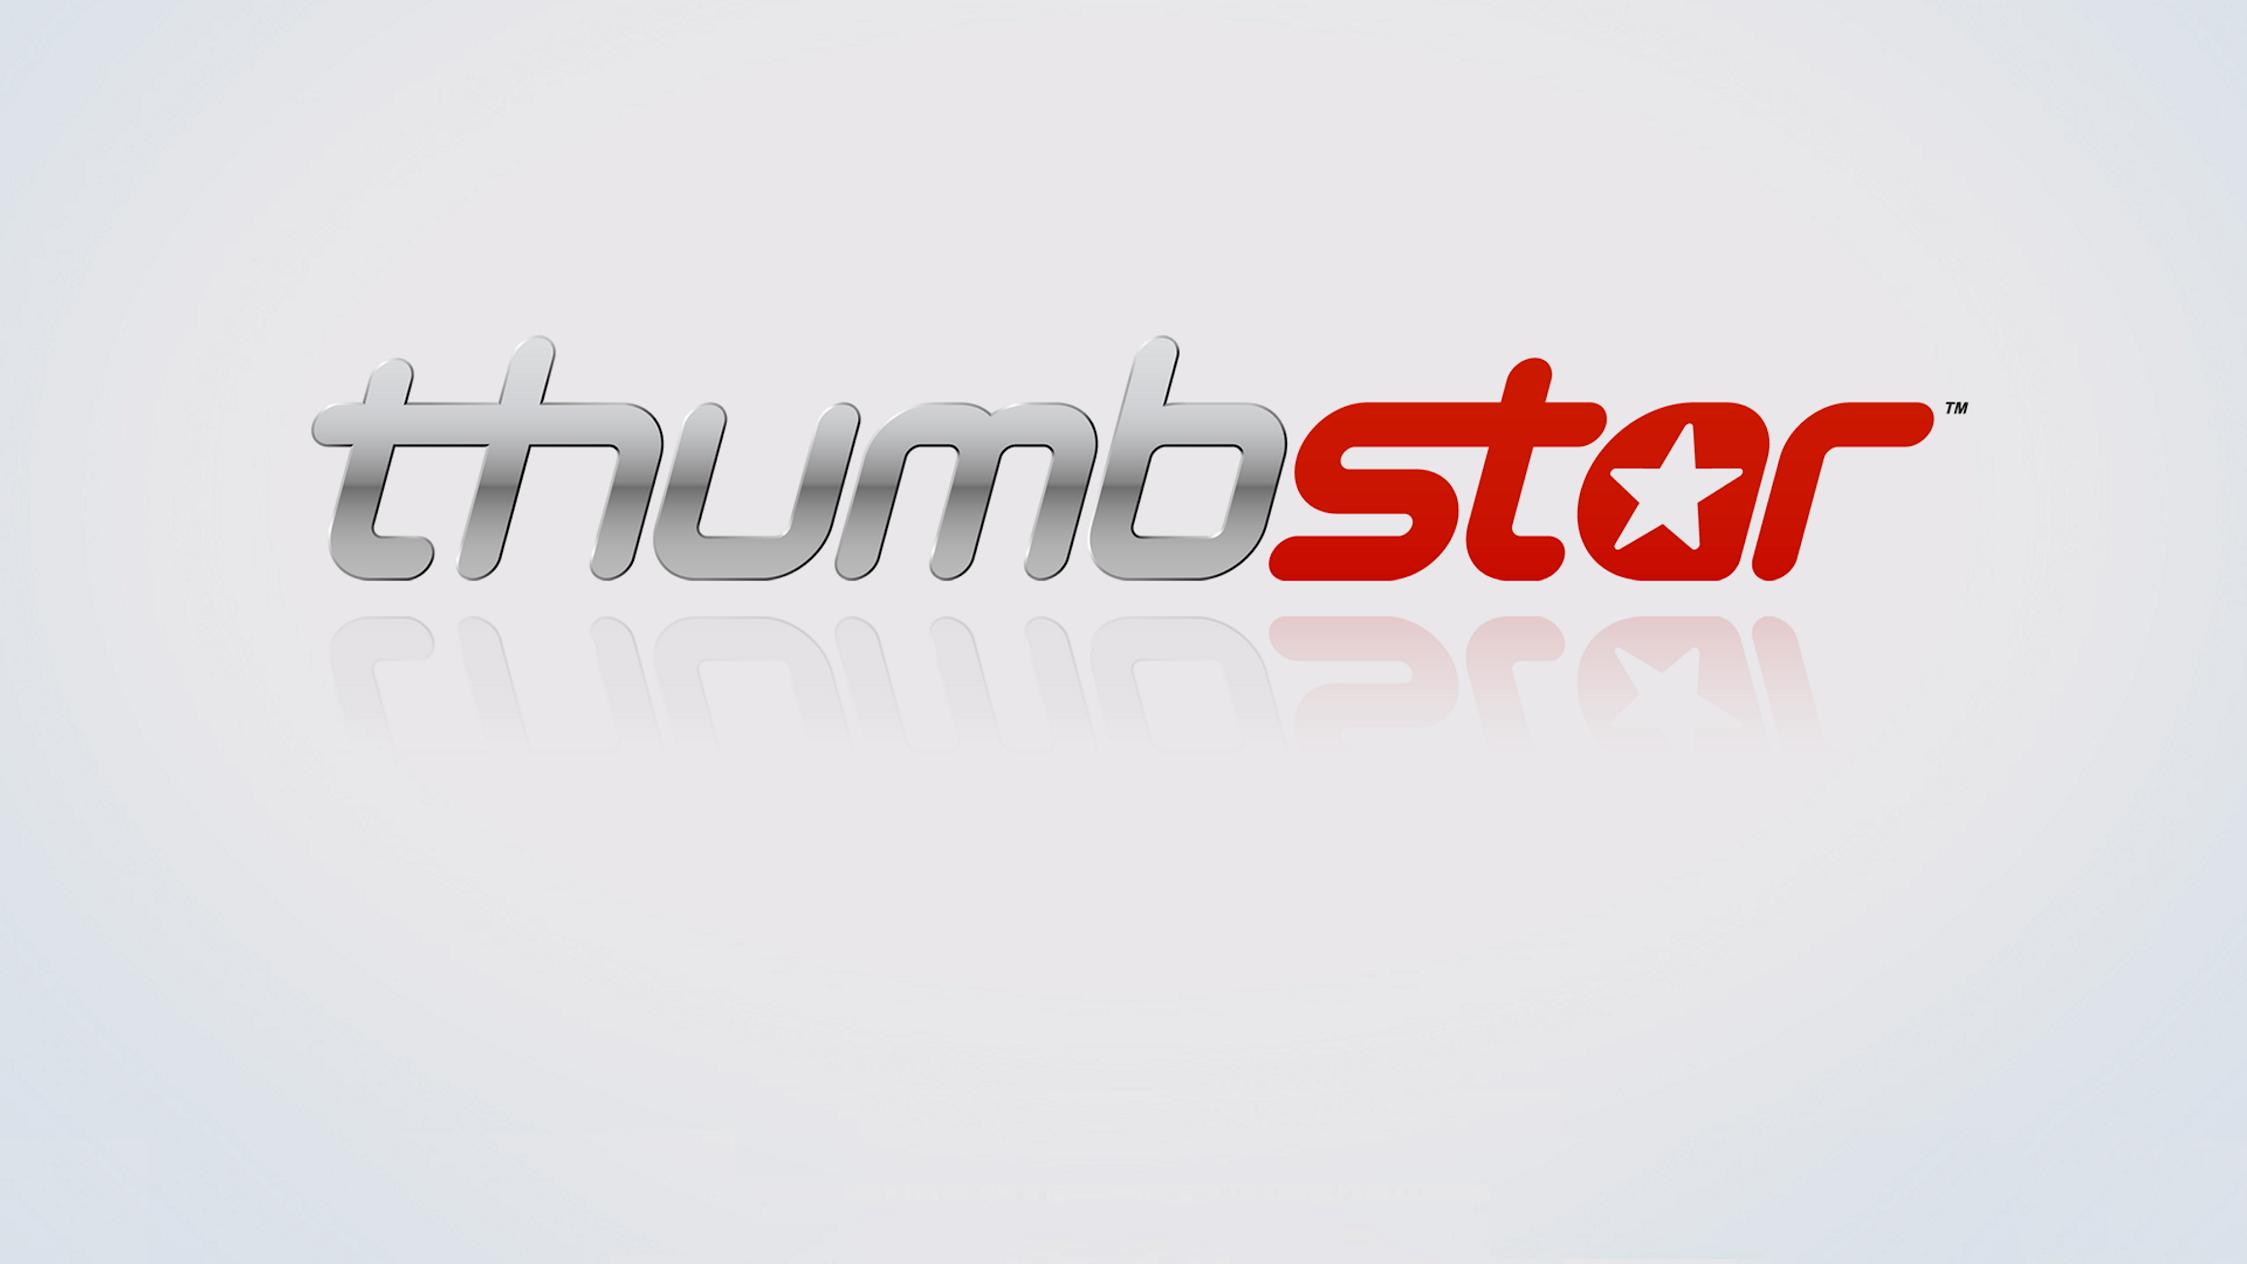 Thumbstar Games Ltd